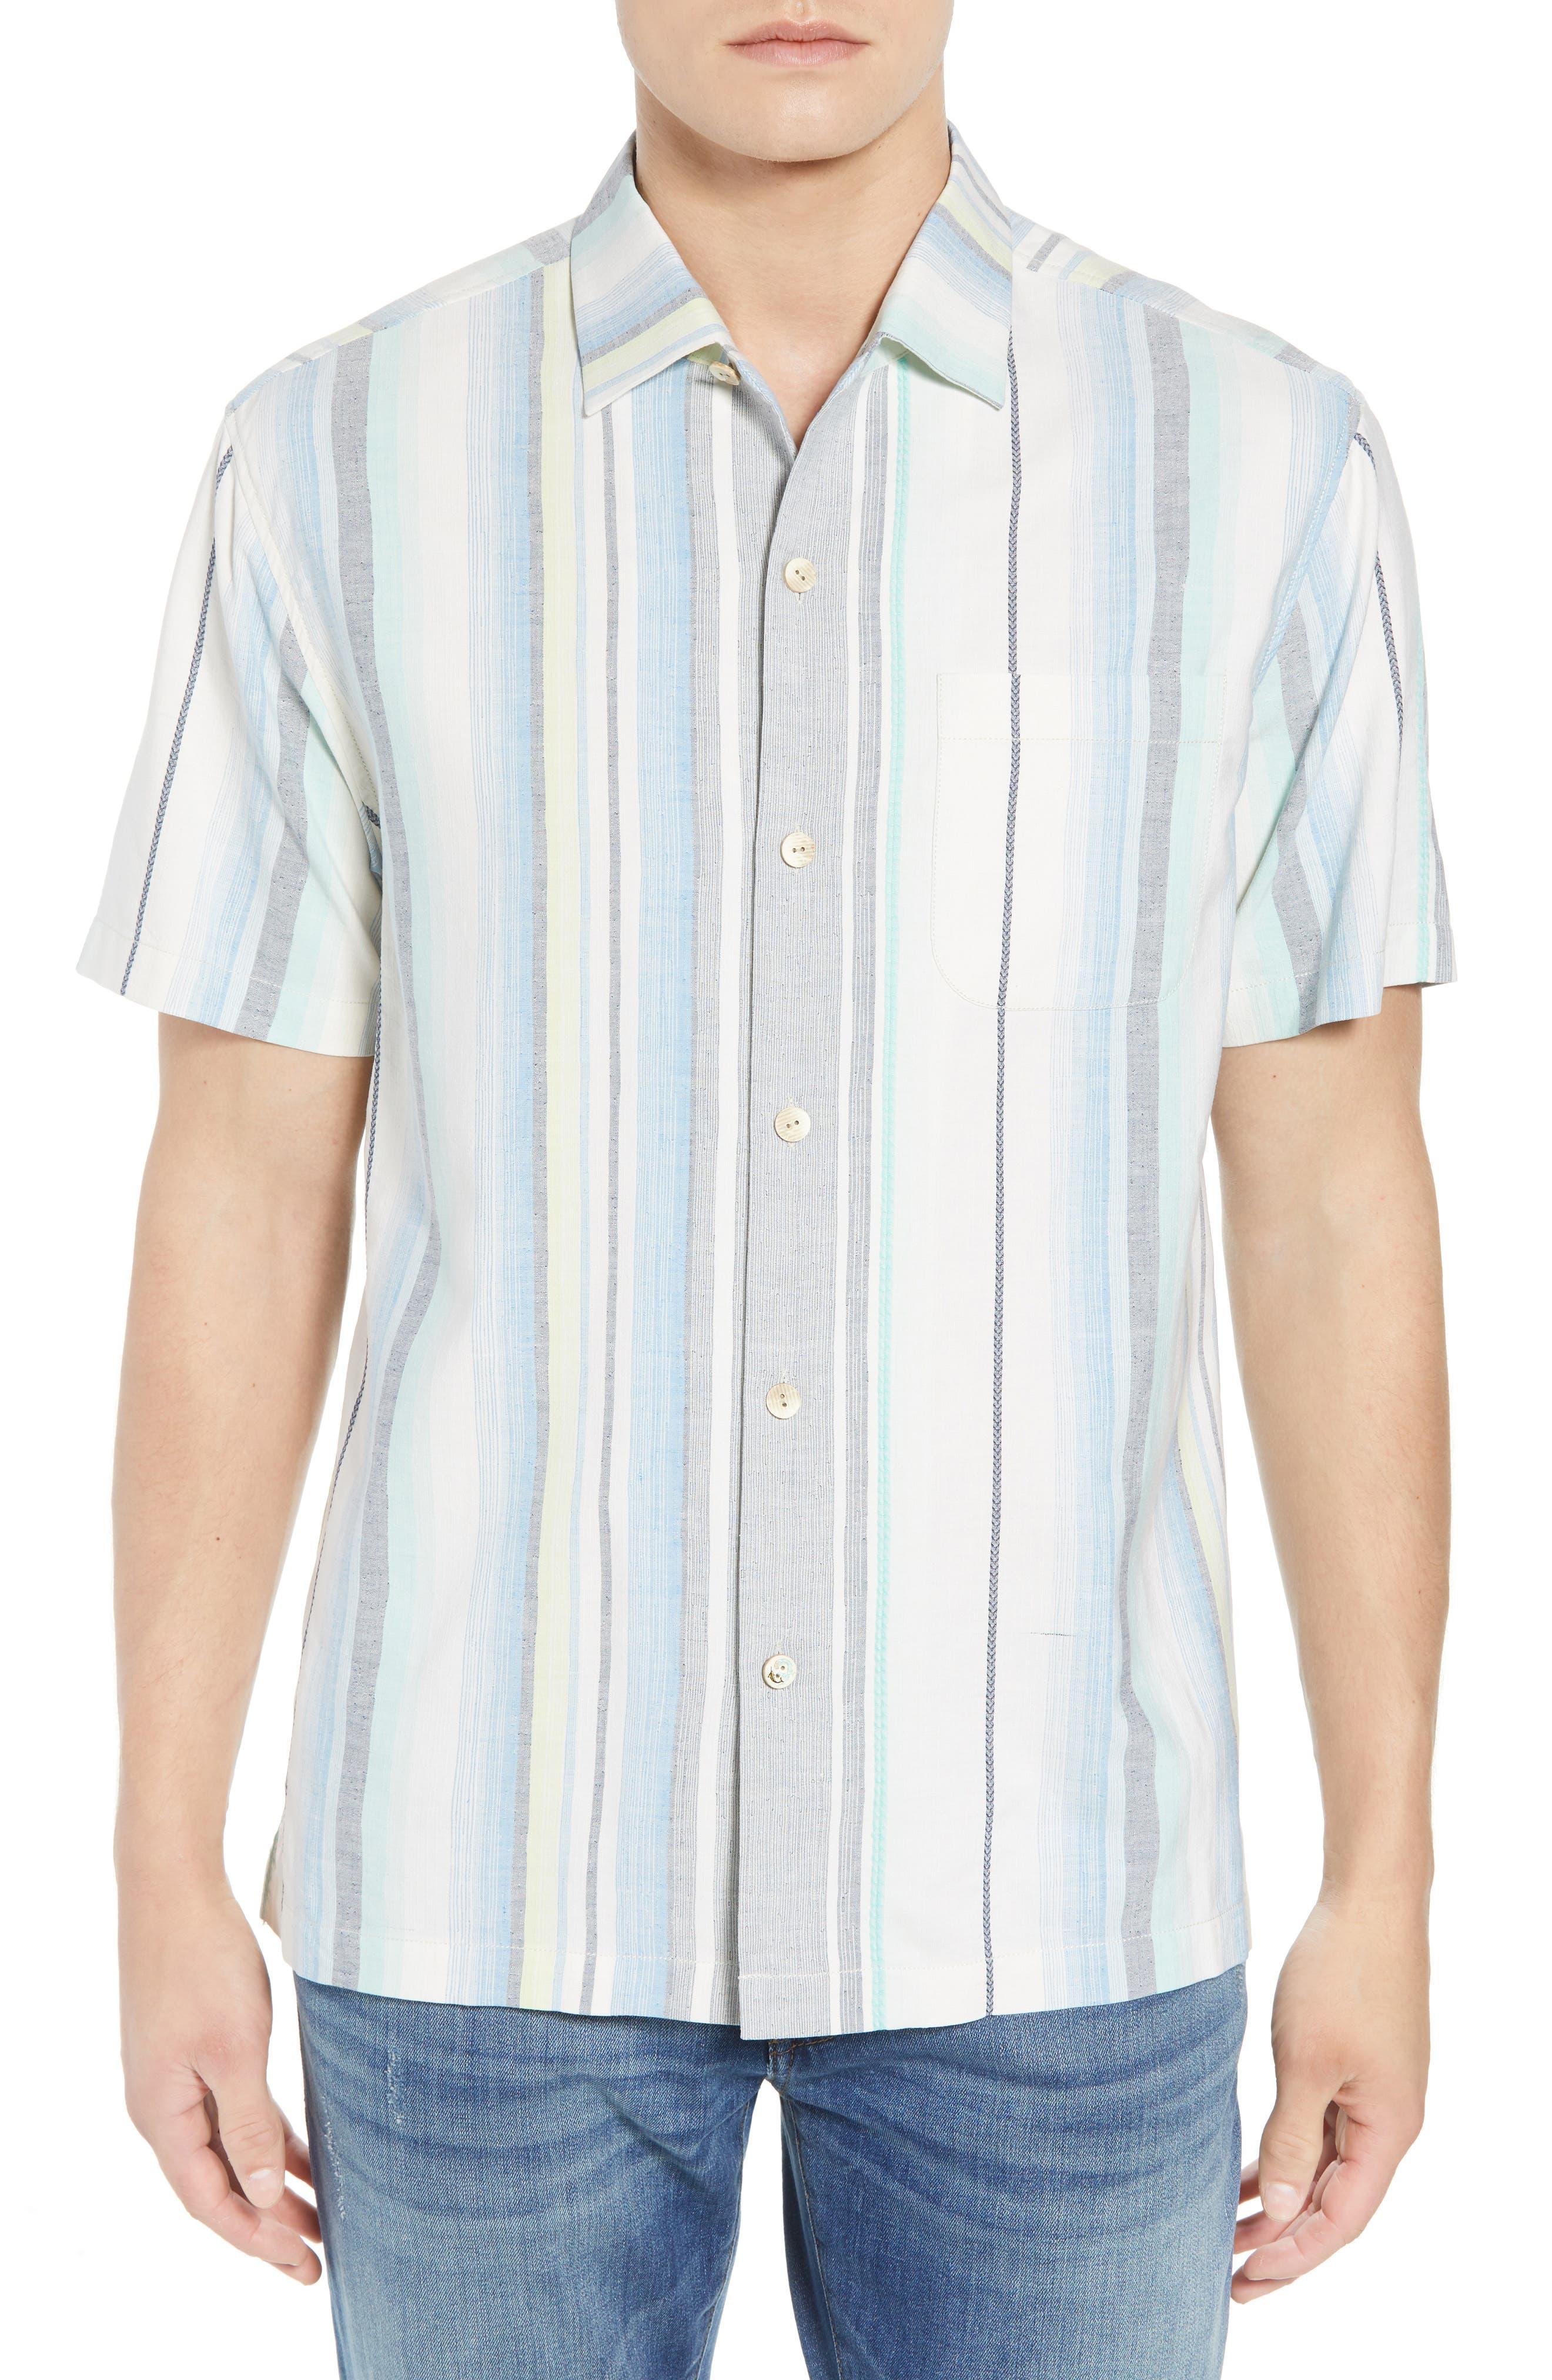 Posado Sands Silk Camp Shirt,                             Main thumbnail 1, color,                             Blue Aster